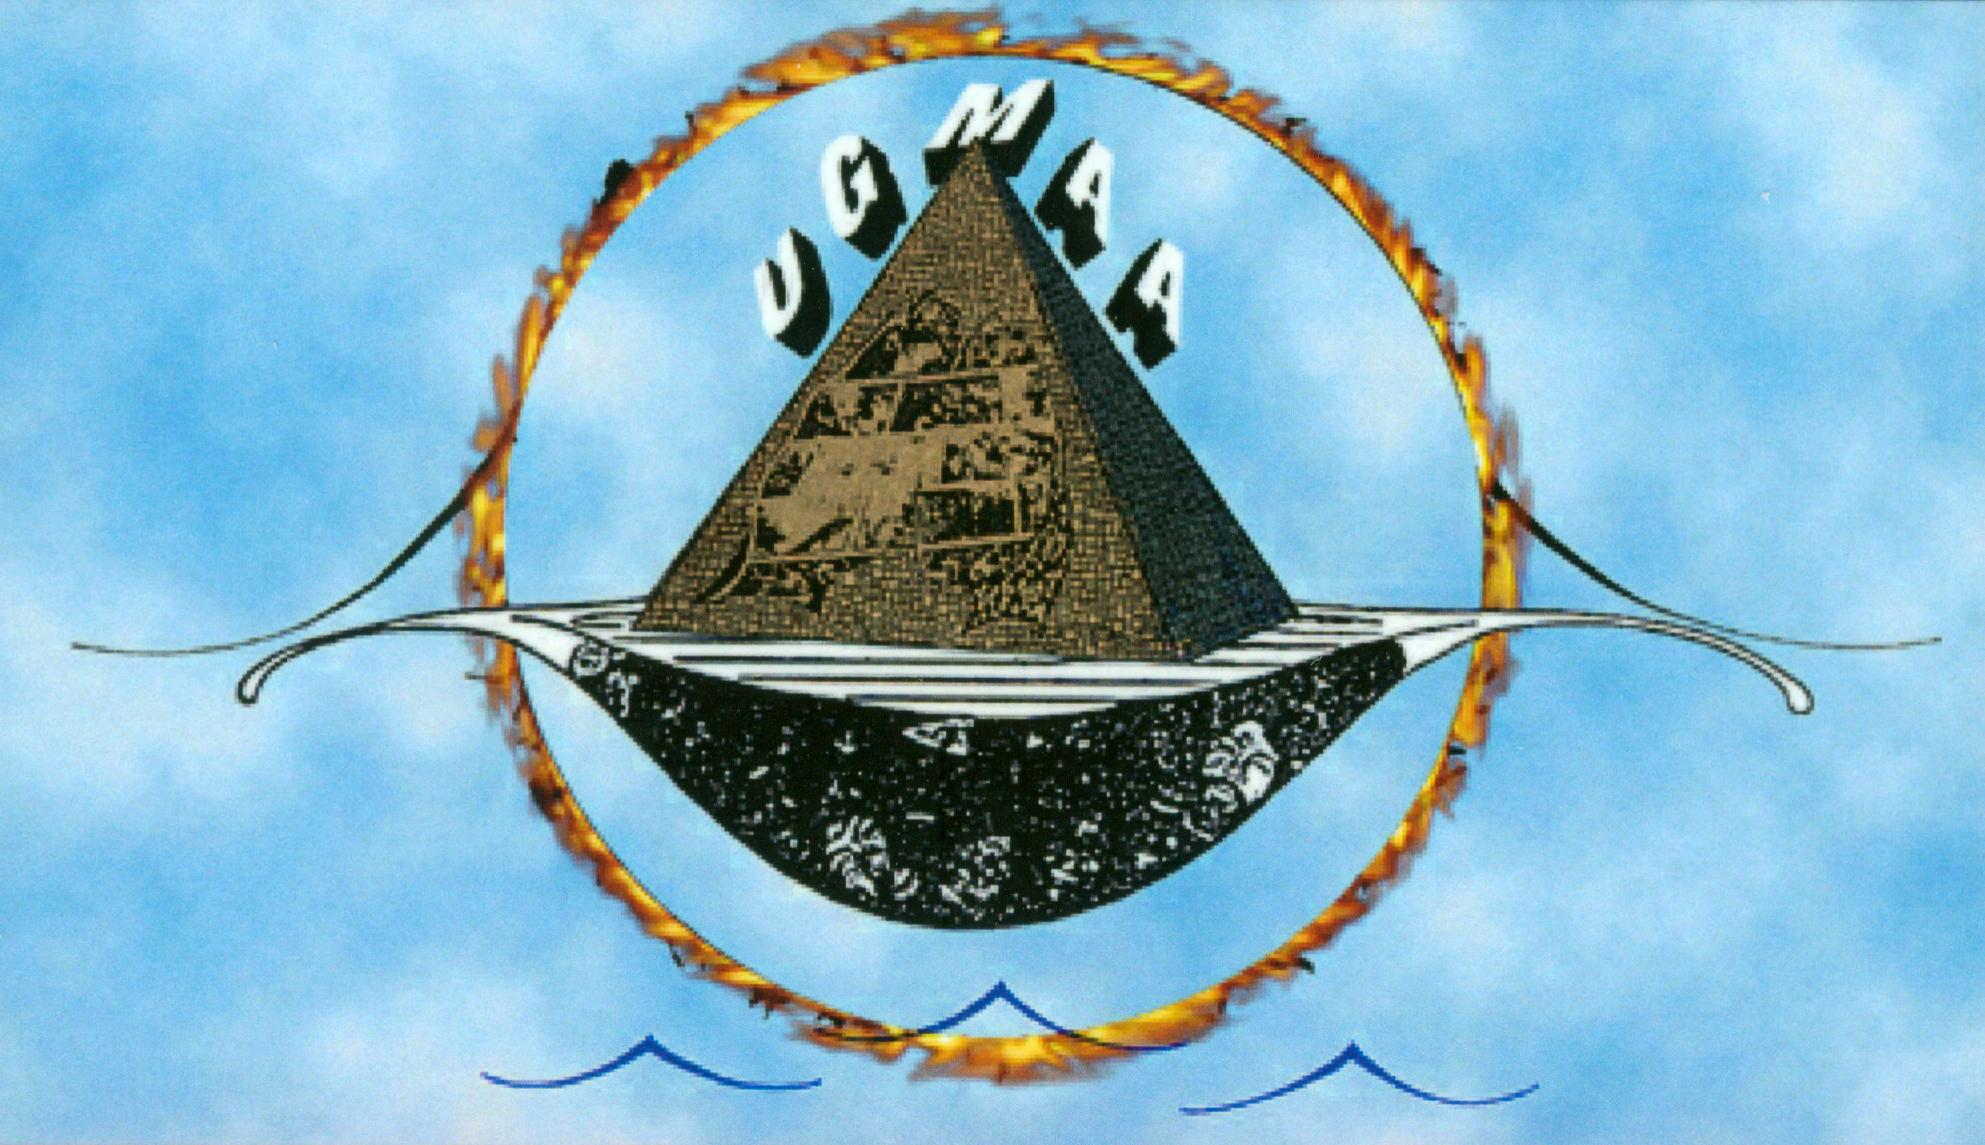 UGMAA Foundation logo, designed by Michael Dett Wilcots, mid-1970s. (© Michael Dett Wilcots)